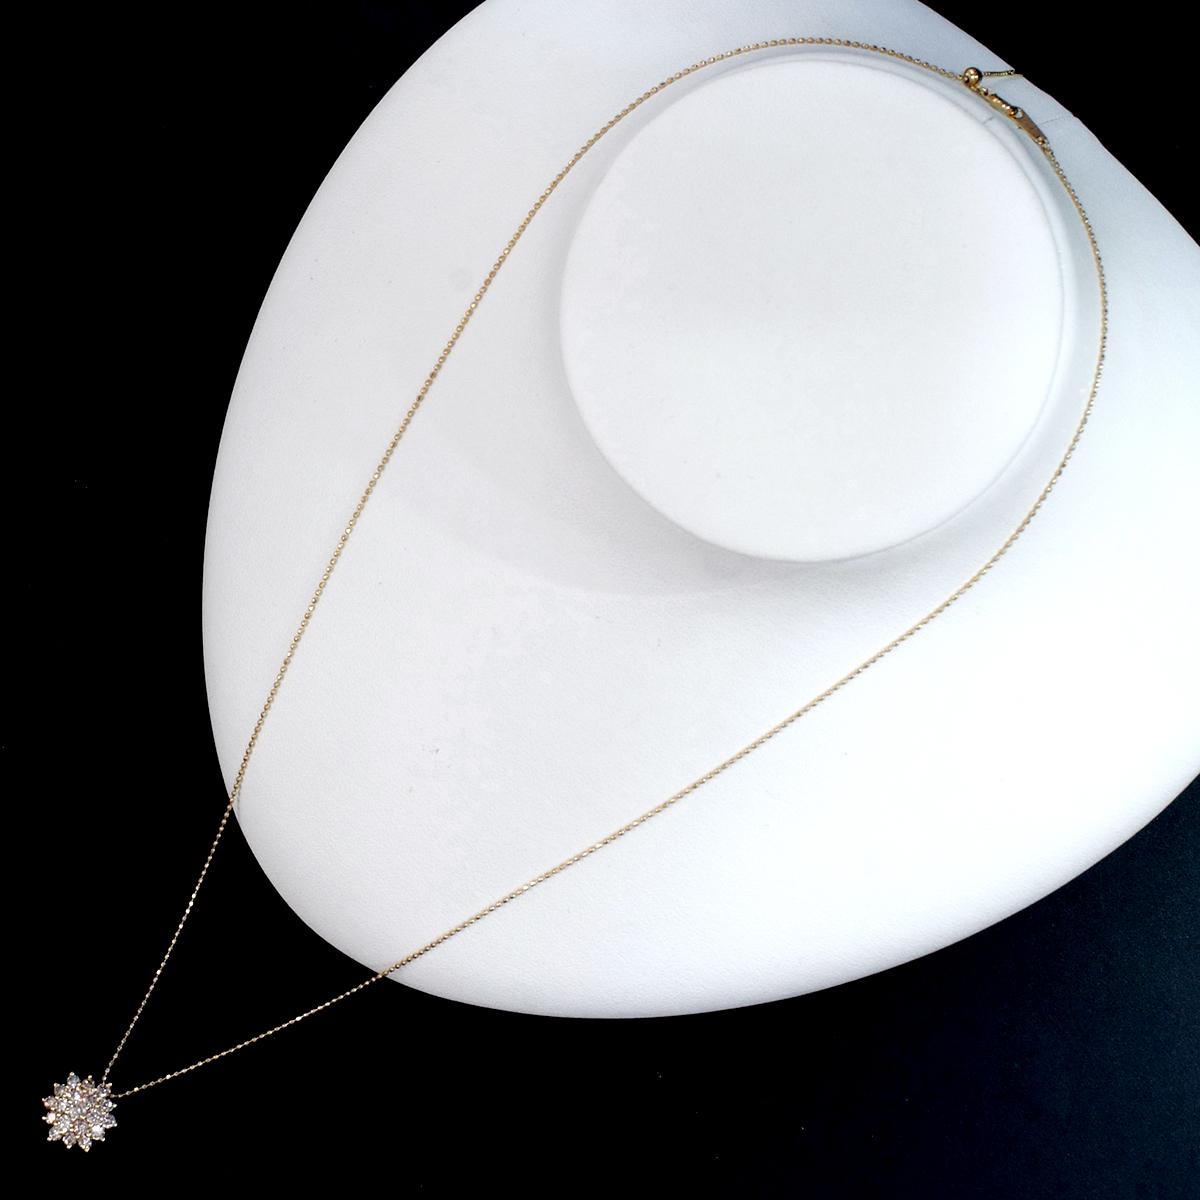 F0855 ファンシーブラウン天然絶品ダイヤモンド1.05ct 最高級18金無垢ネックレス フリーサイズ(最長50cm) 重量3.5g 幅13.5mm_画像4